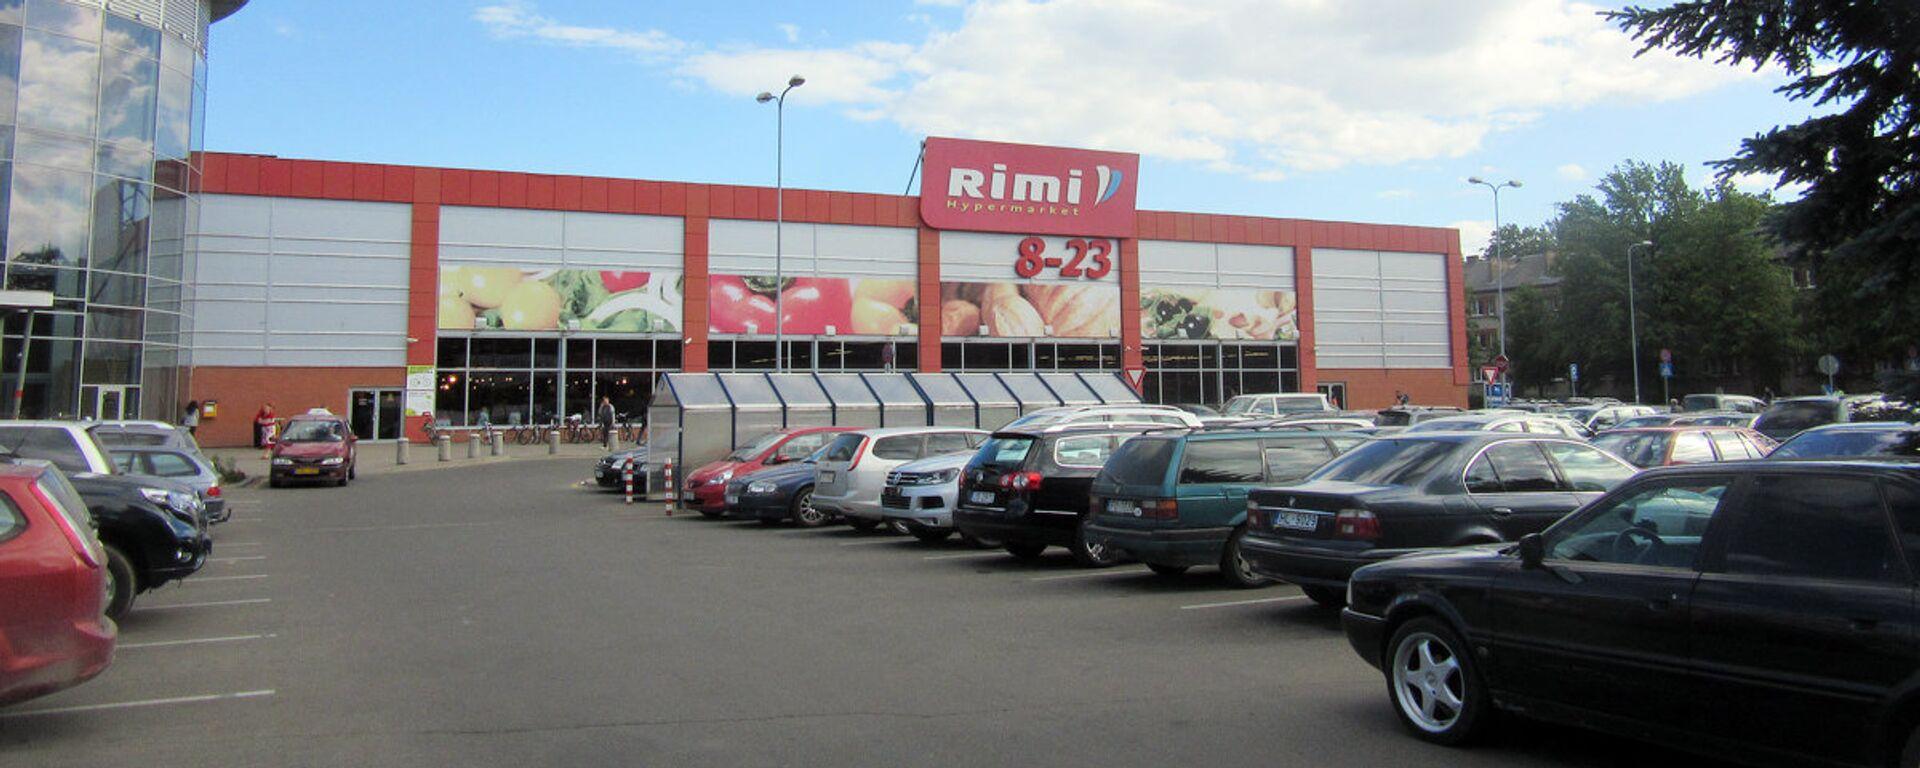 Гипермаркет Rimi - Sputnik Латвия, 1920, 29.03.2021